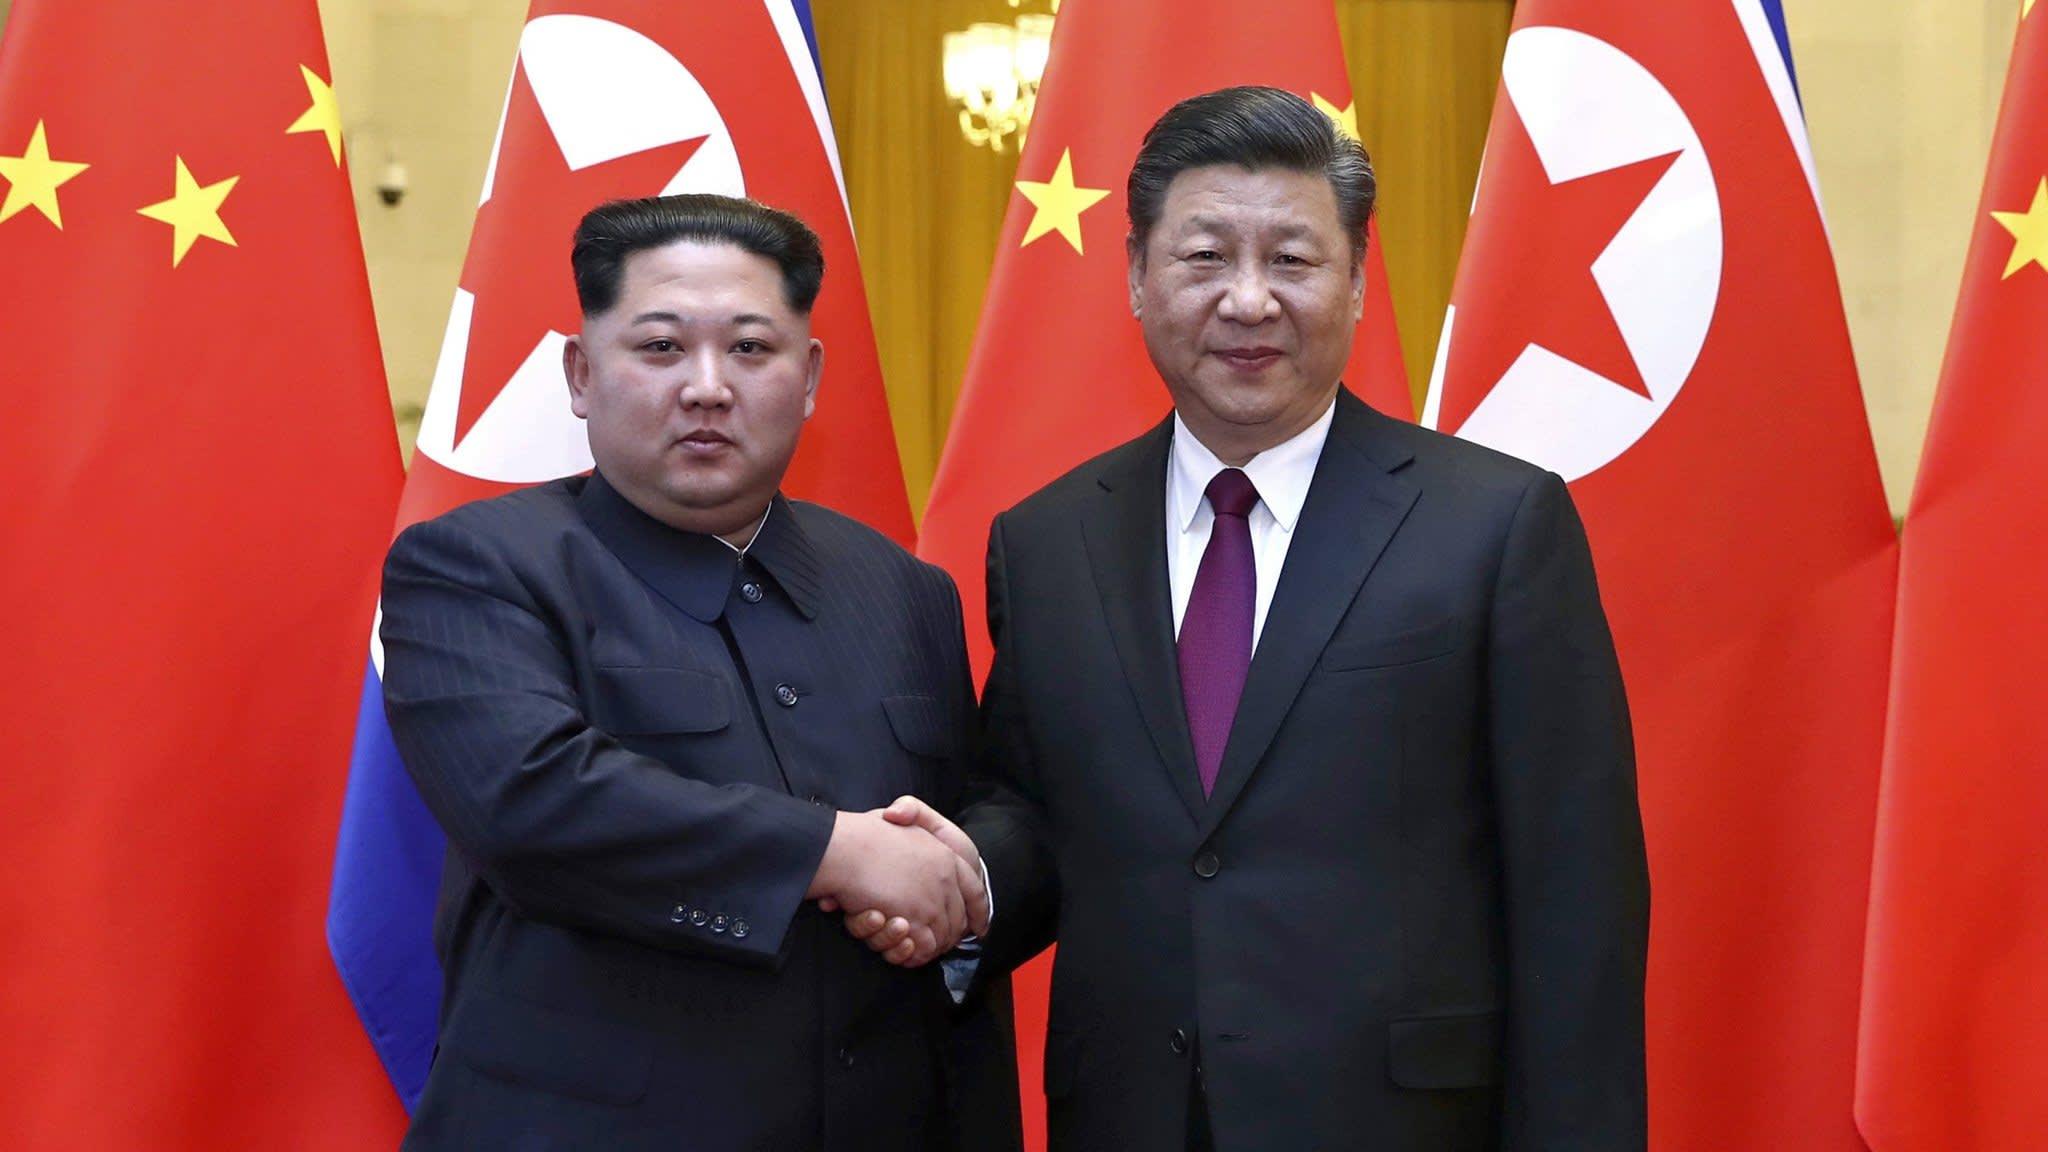 Kim Jong Un confirms summits with US and South Korea